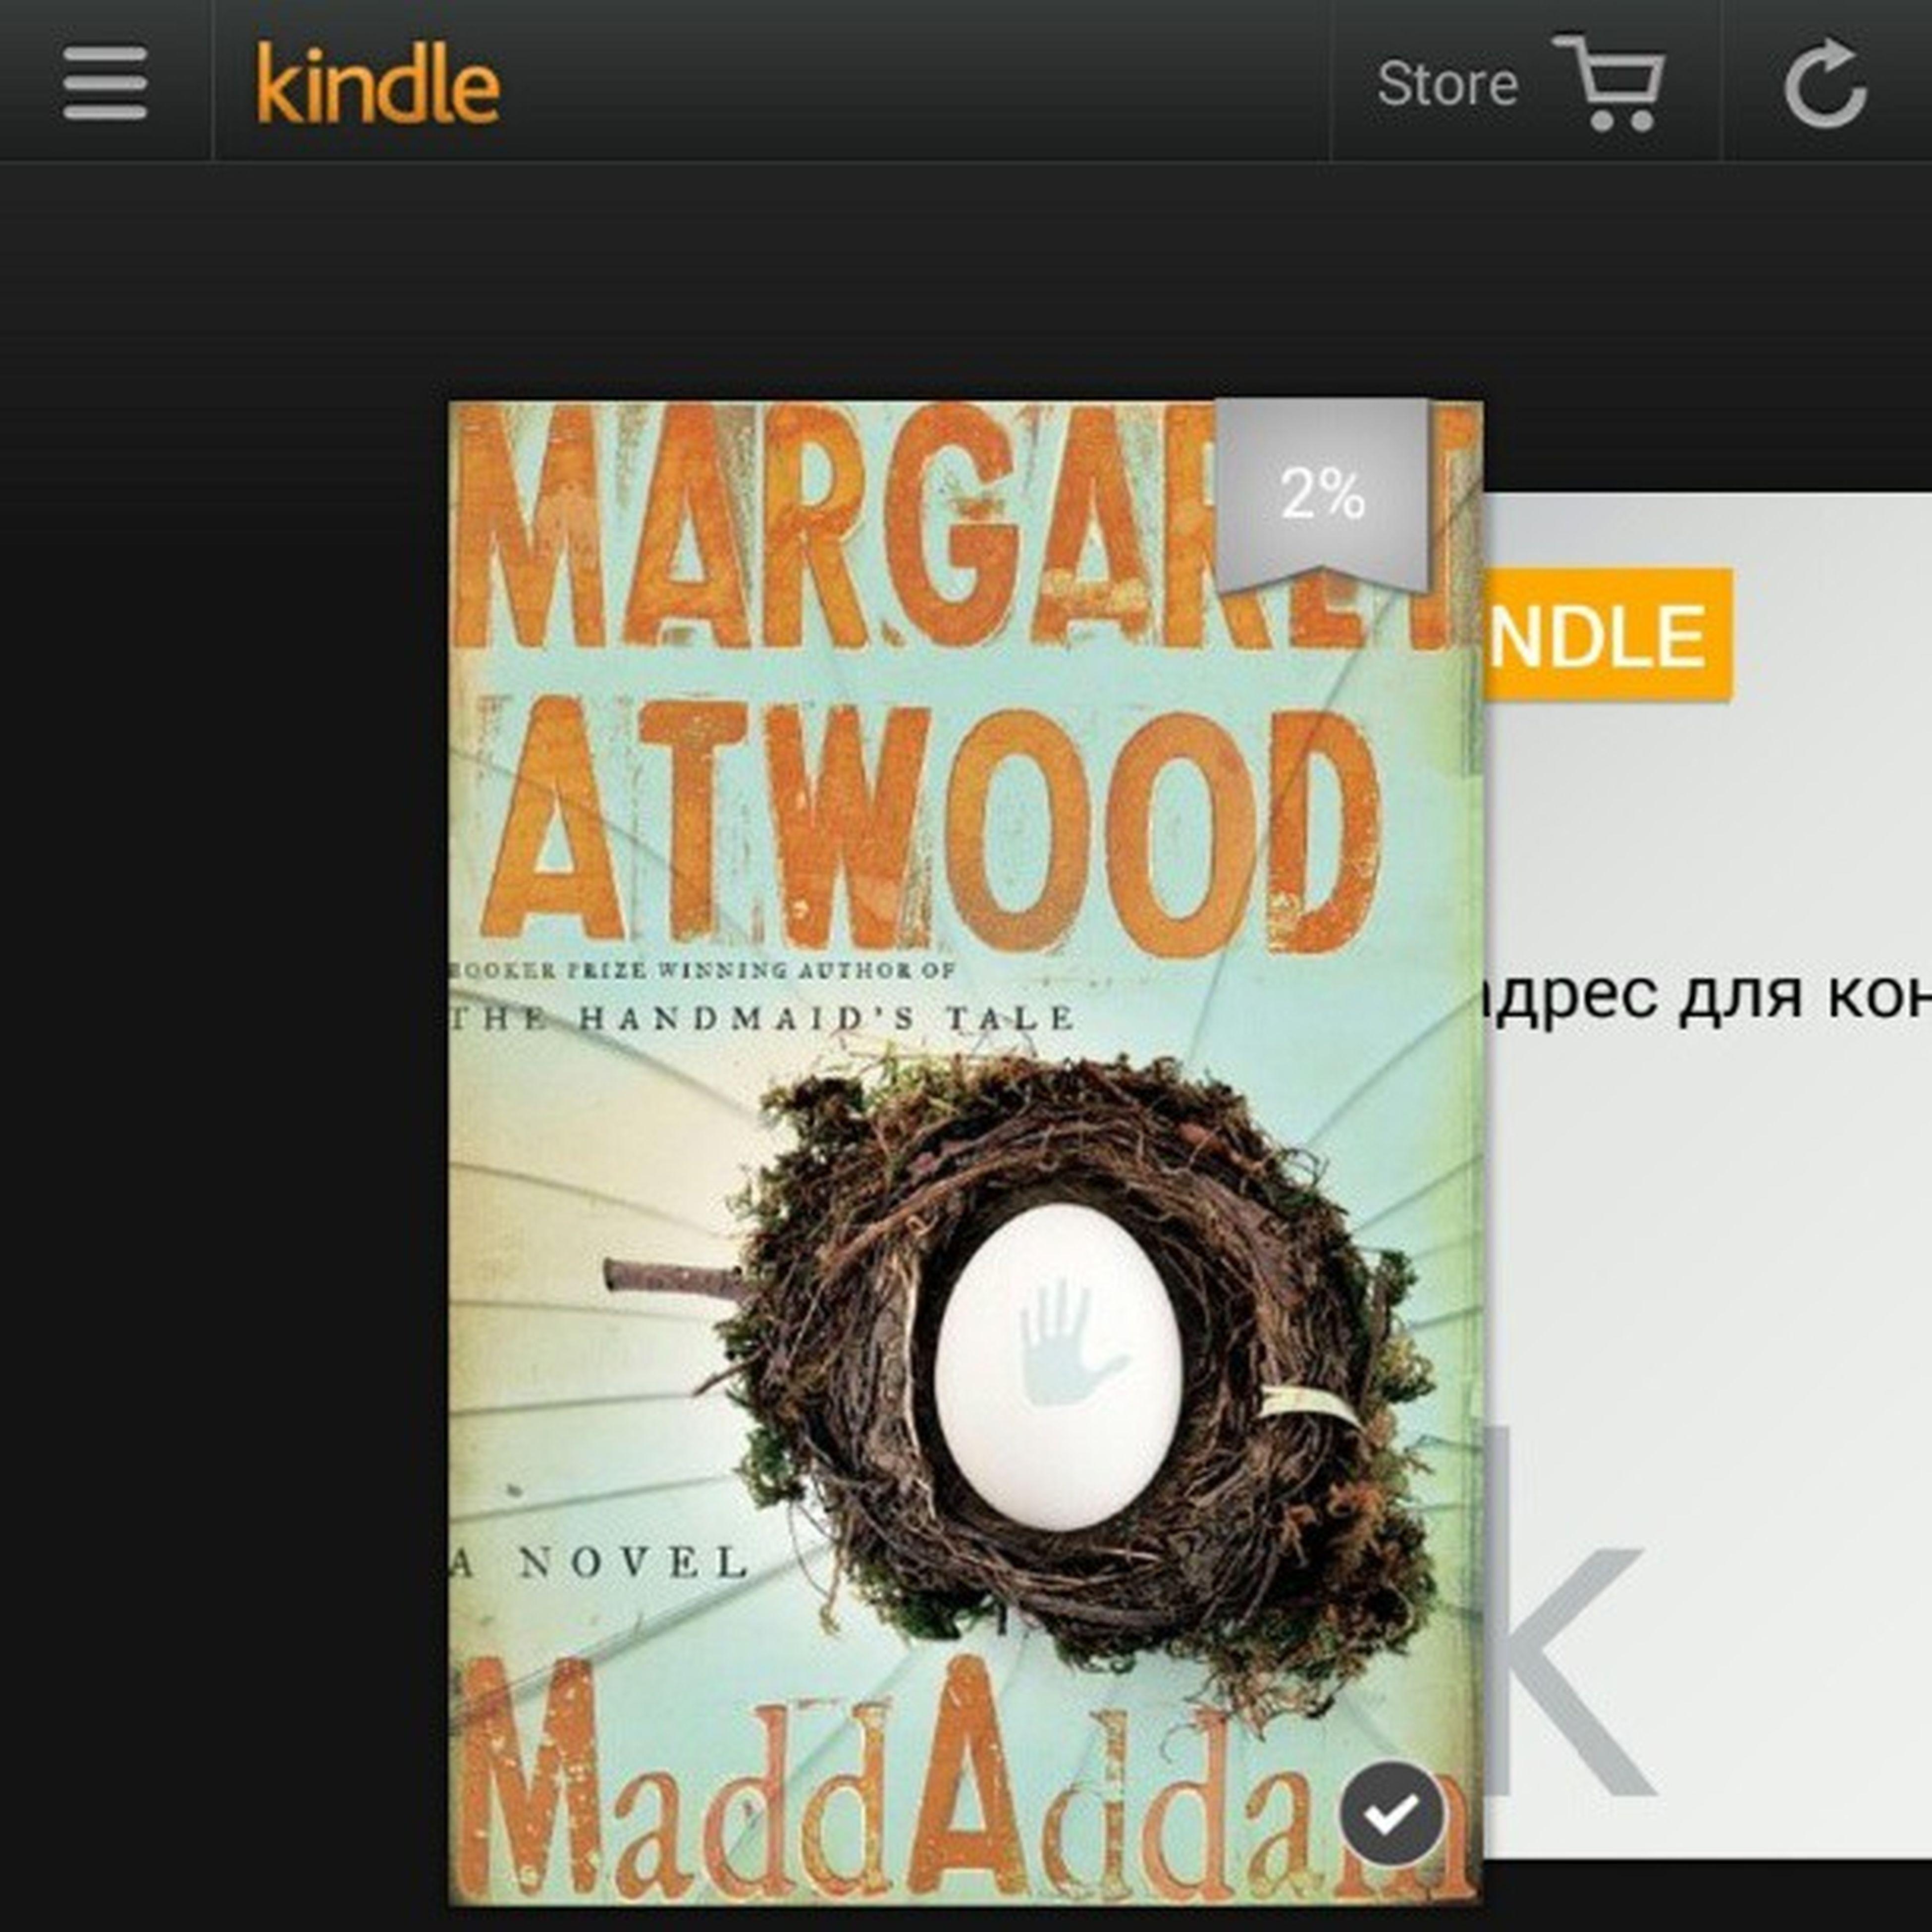 Сама завидуй @main_bee у меня цветная! @@Atwood Maddaddam Trilogy